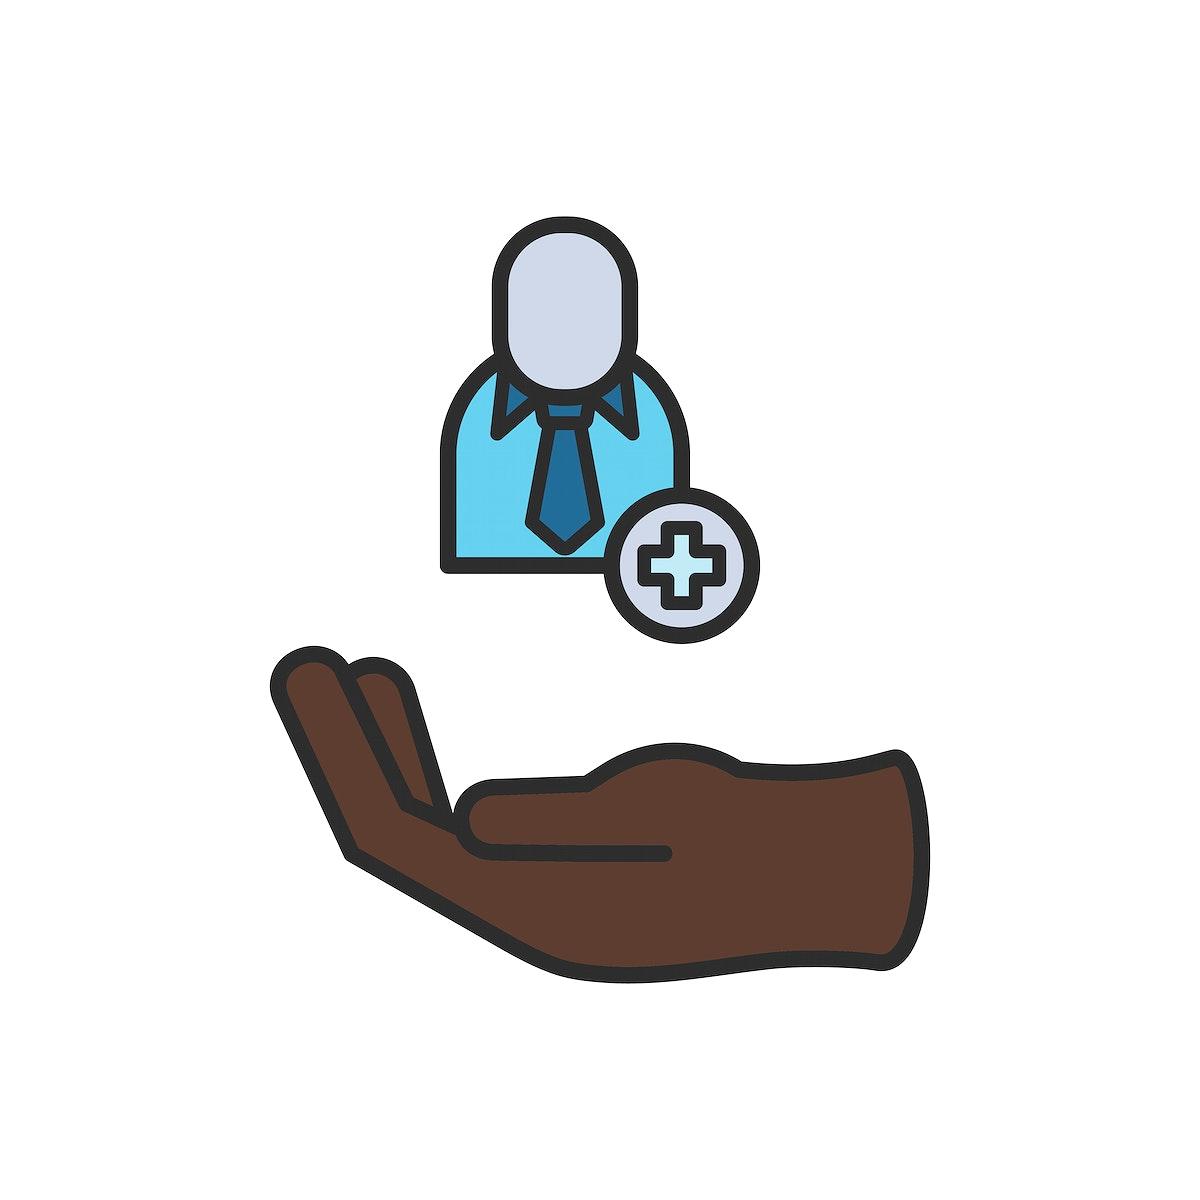 Illustration of business icon